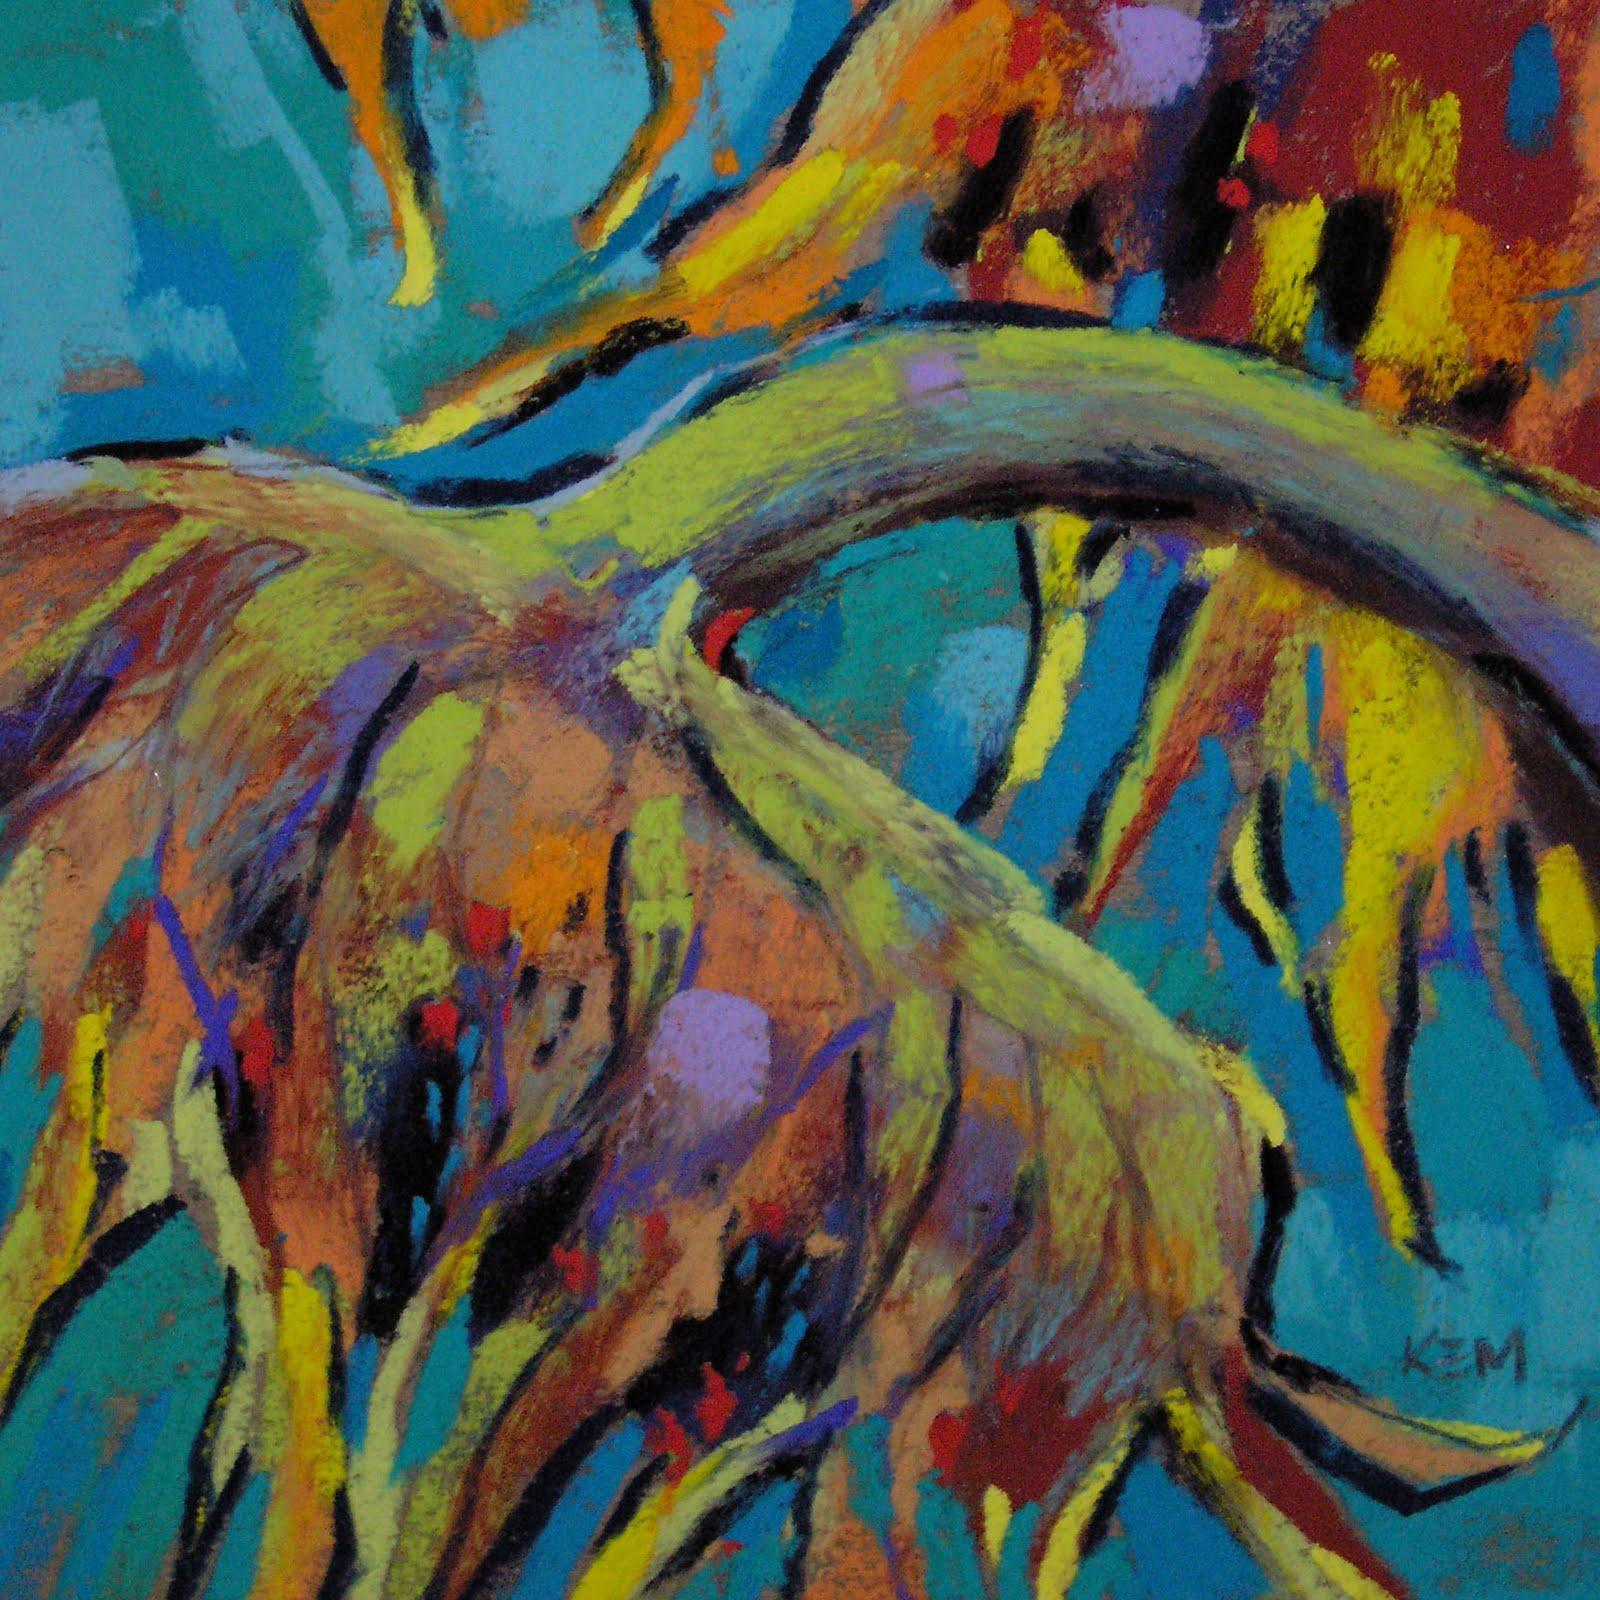 """A Sunny Day ...Sunflower Painting 6x6 pastel"" original fine art by Karen Margulis"